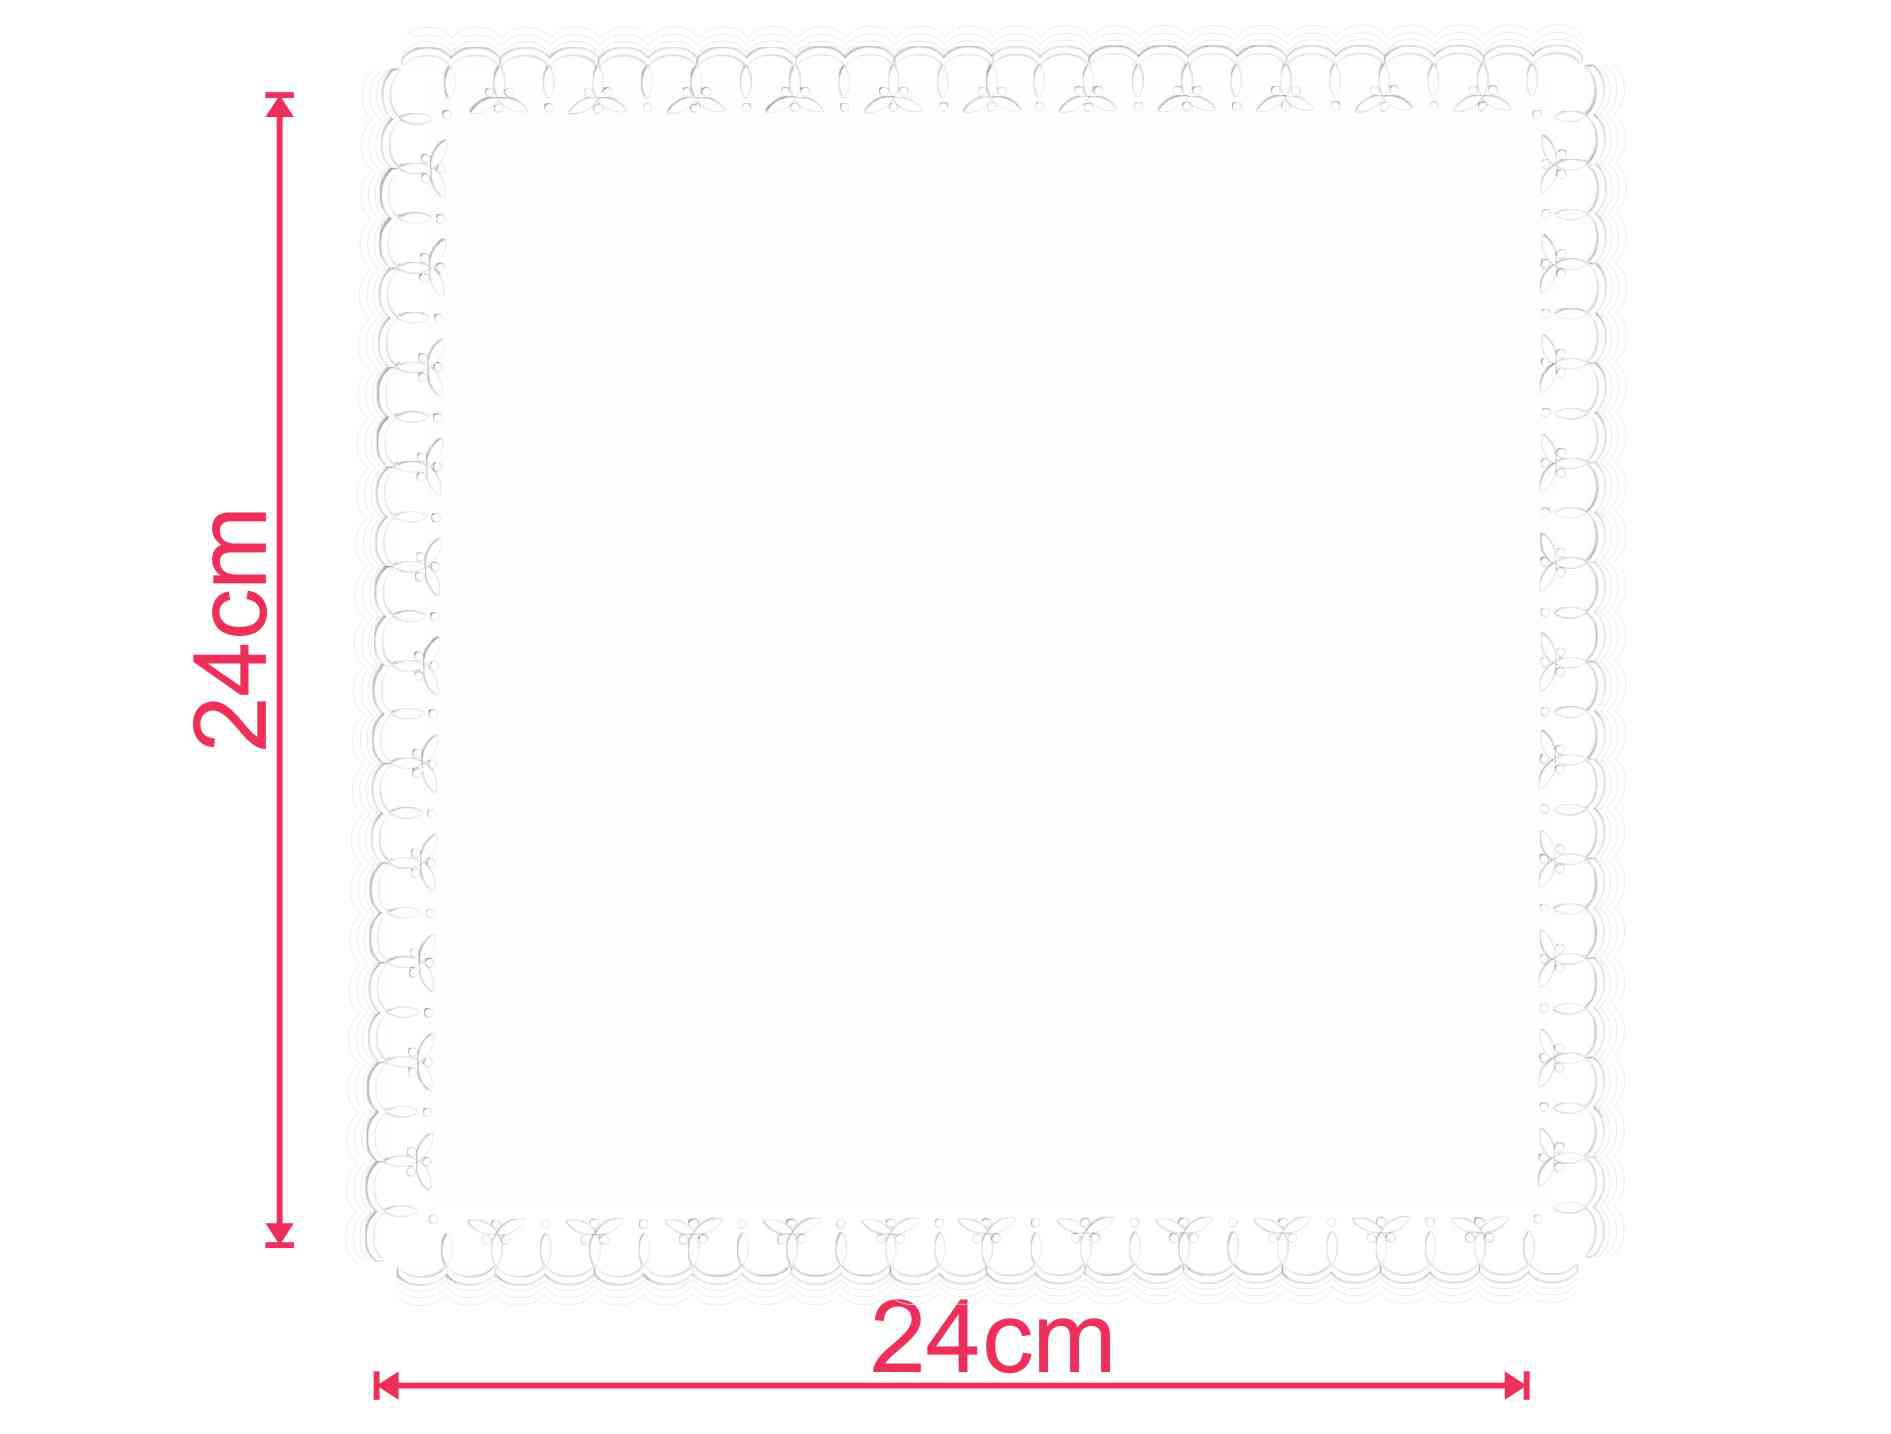 Guardanapo de papel mod. Trevo 24x24 cm - Personalizado - 100 unidades  - Persona Guardanapos & Cia